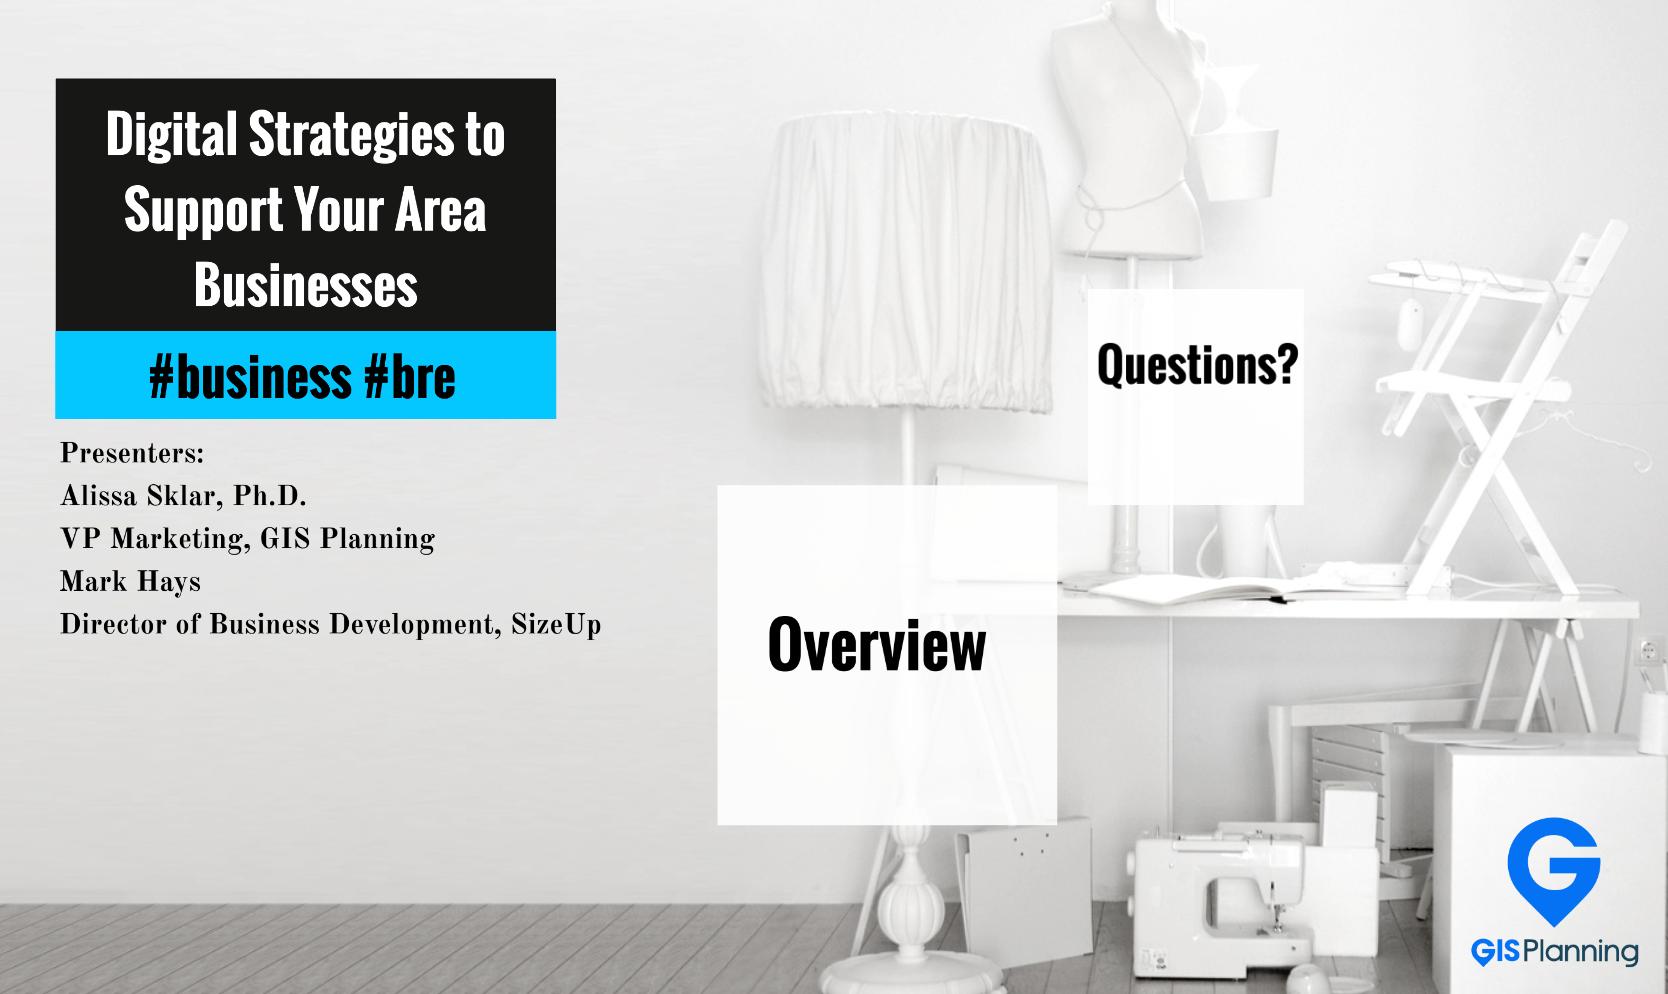 Digital_Strategies_Area_Businesses___Prezi